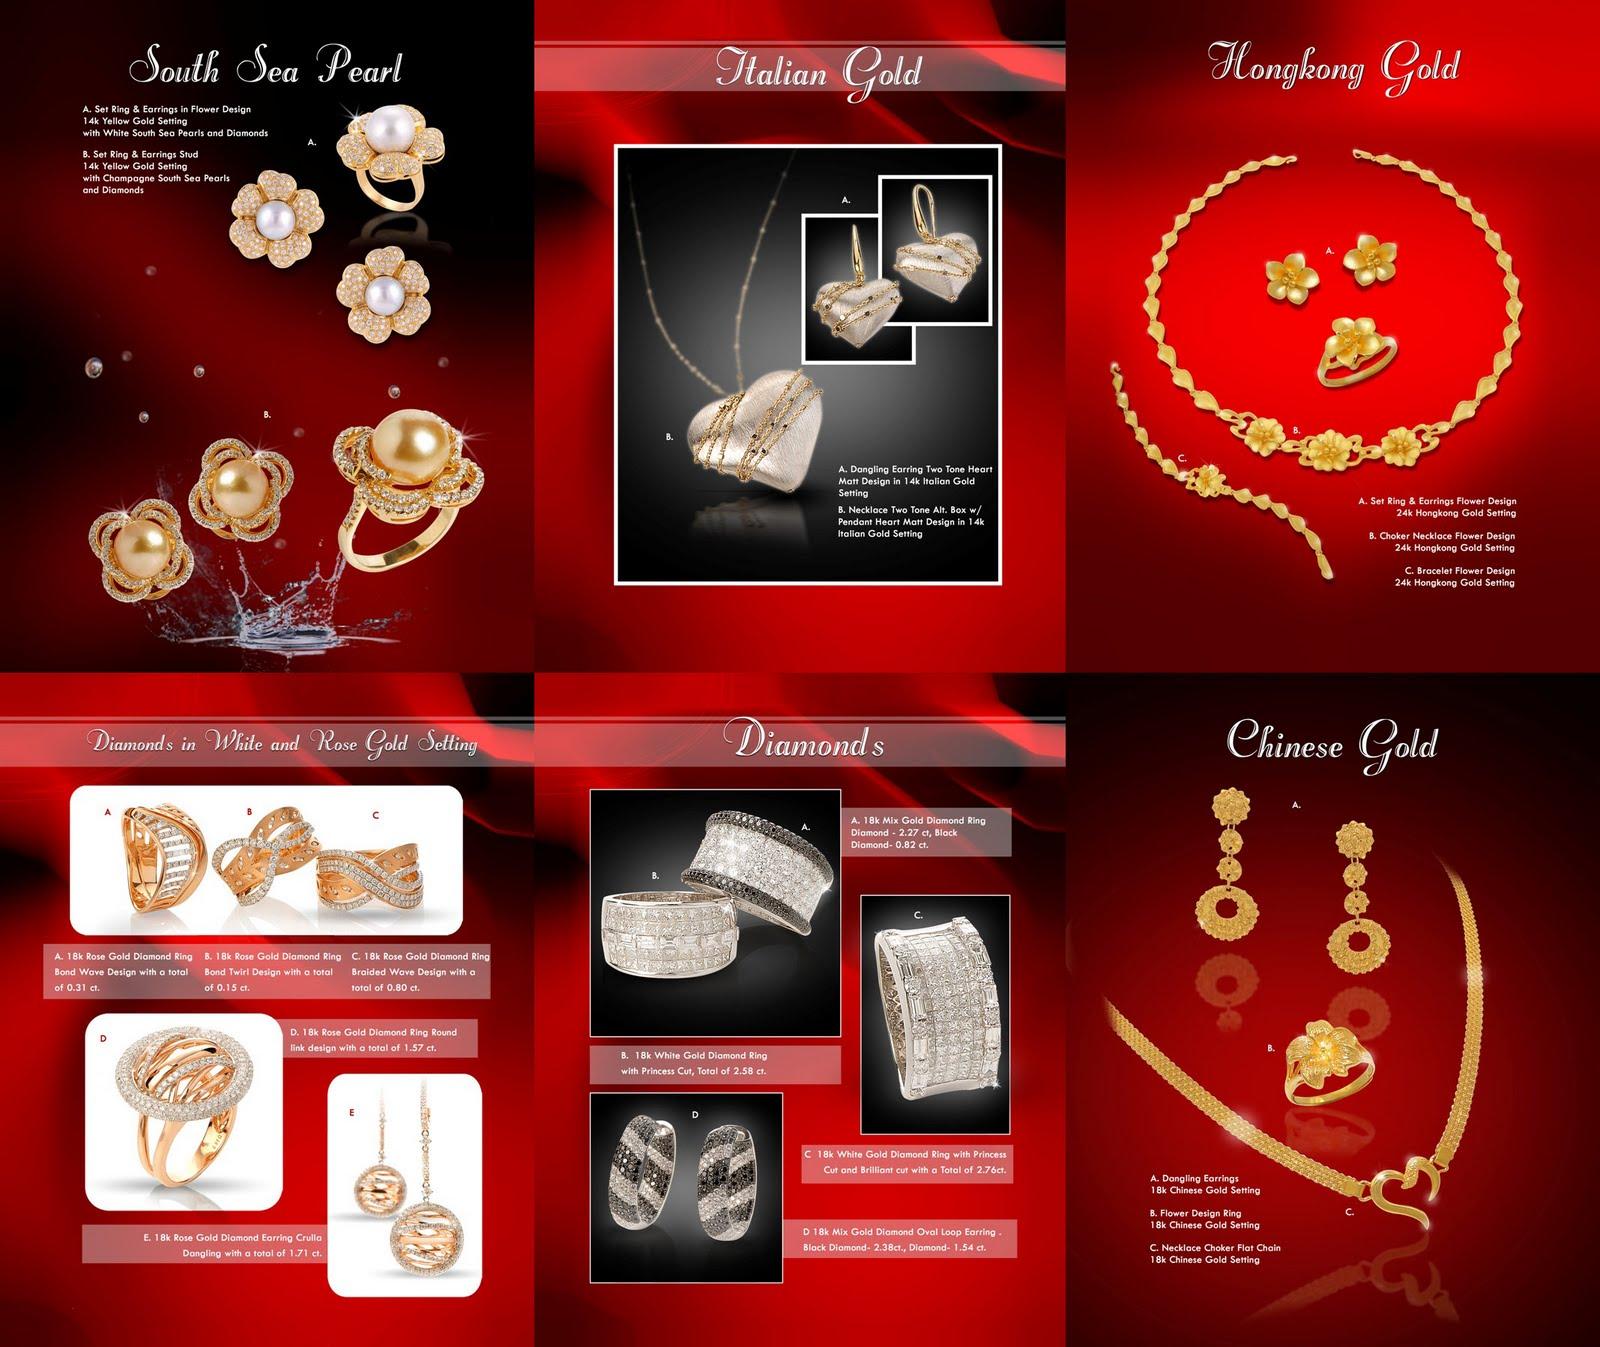 Oro China Jewelry. Wedding Set Engagement Rings. Crucifix Rings. Aurora Wedding Engagement Rings. Celebration Engagement Rings. Wedding Dress Wedding Rings. Beard Rings. 3d Printed Rings. Gaudy Wedding Rings